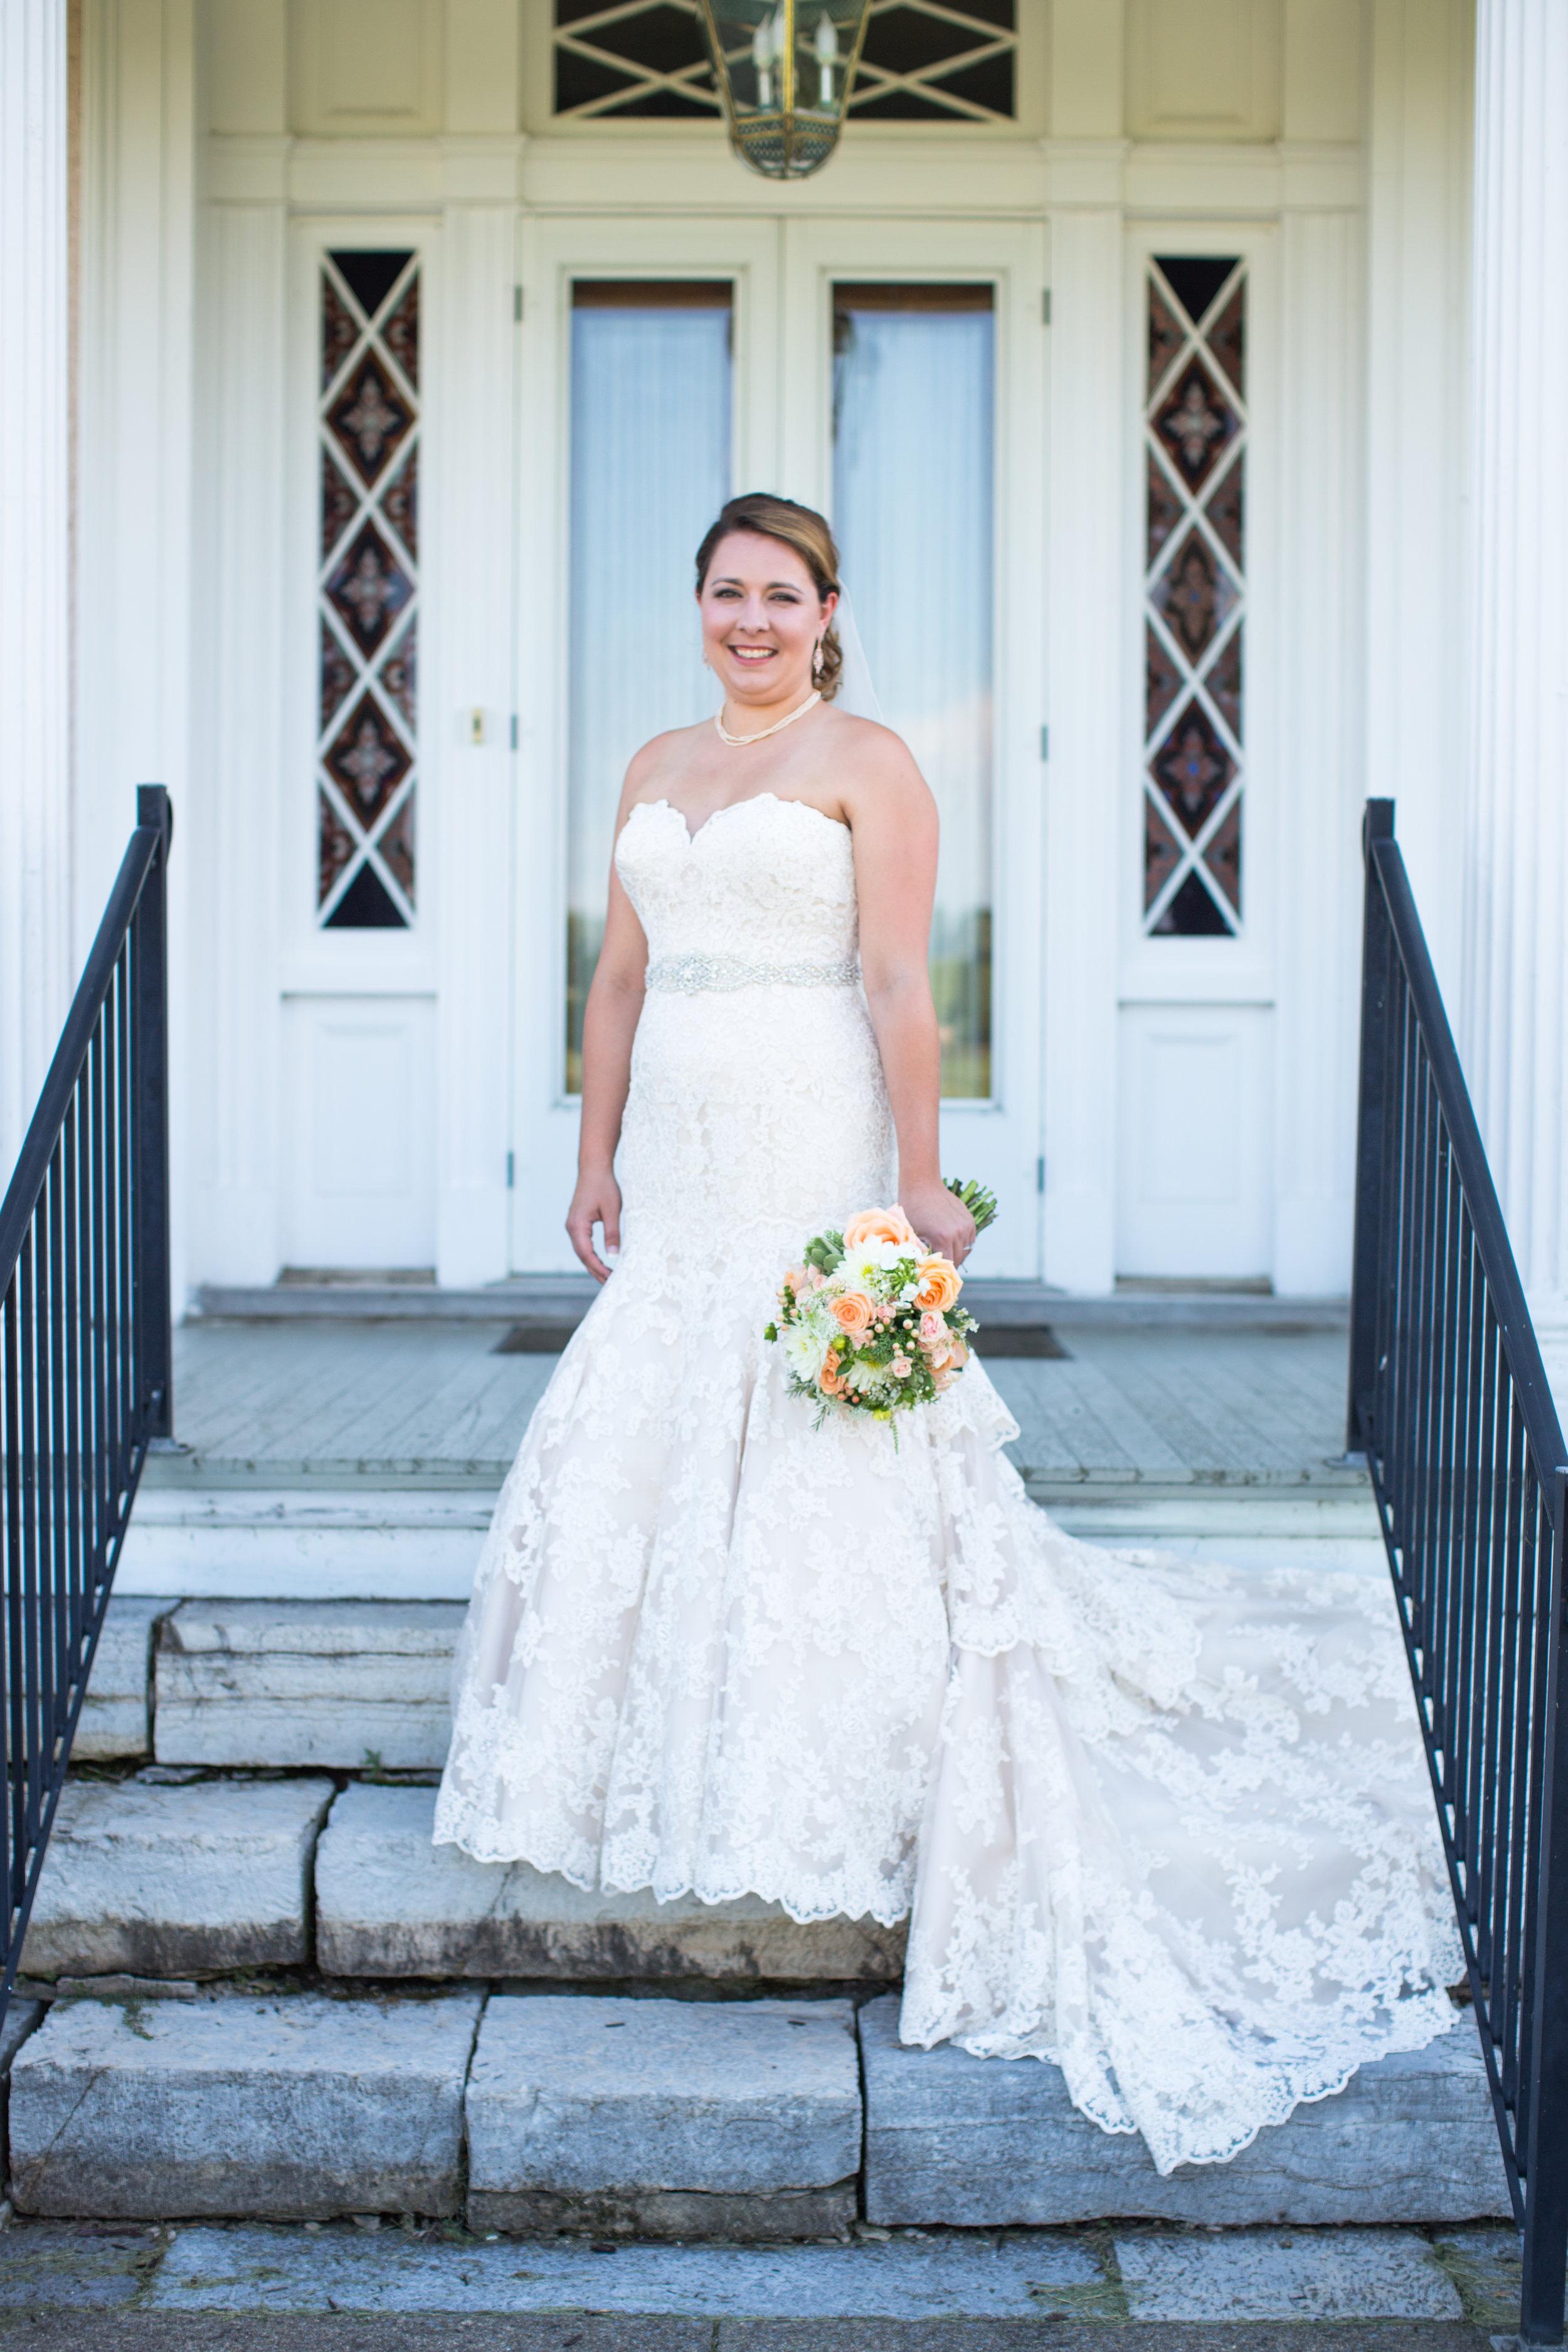 Chandler & Jessica Married 8.13.16 593.jpg